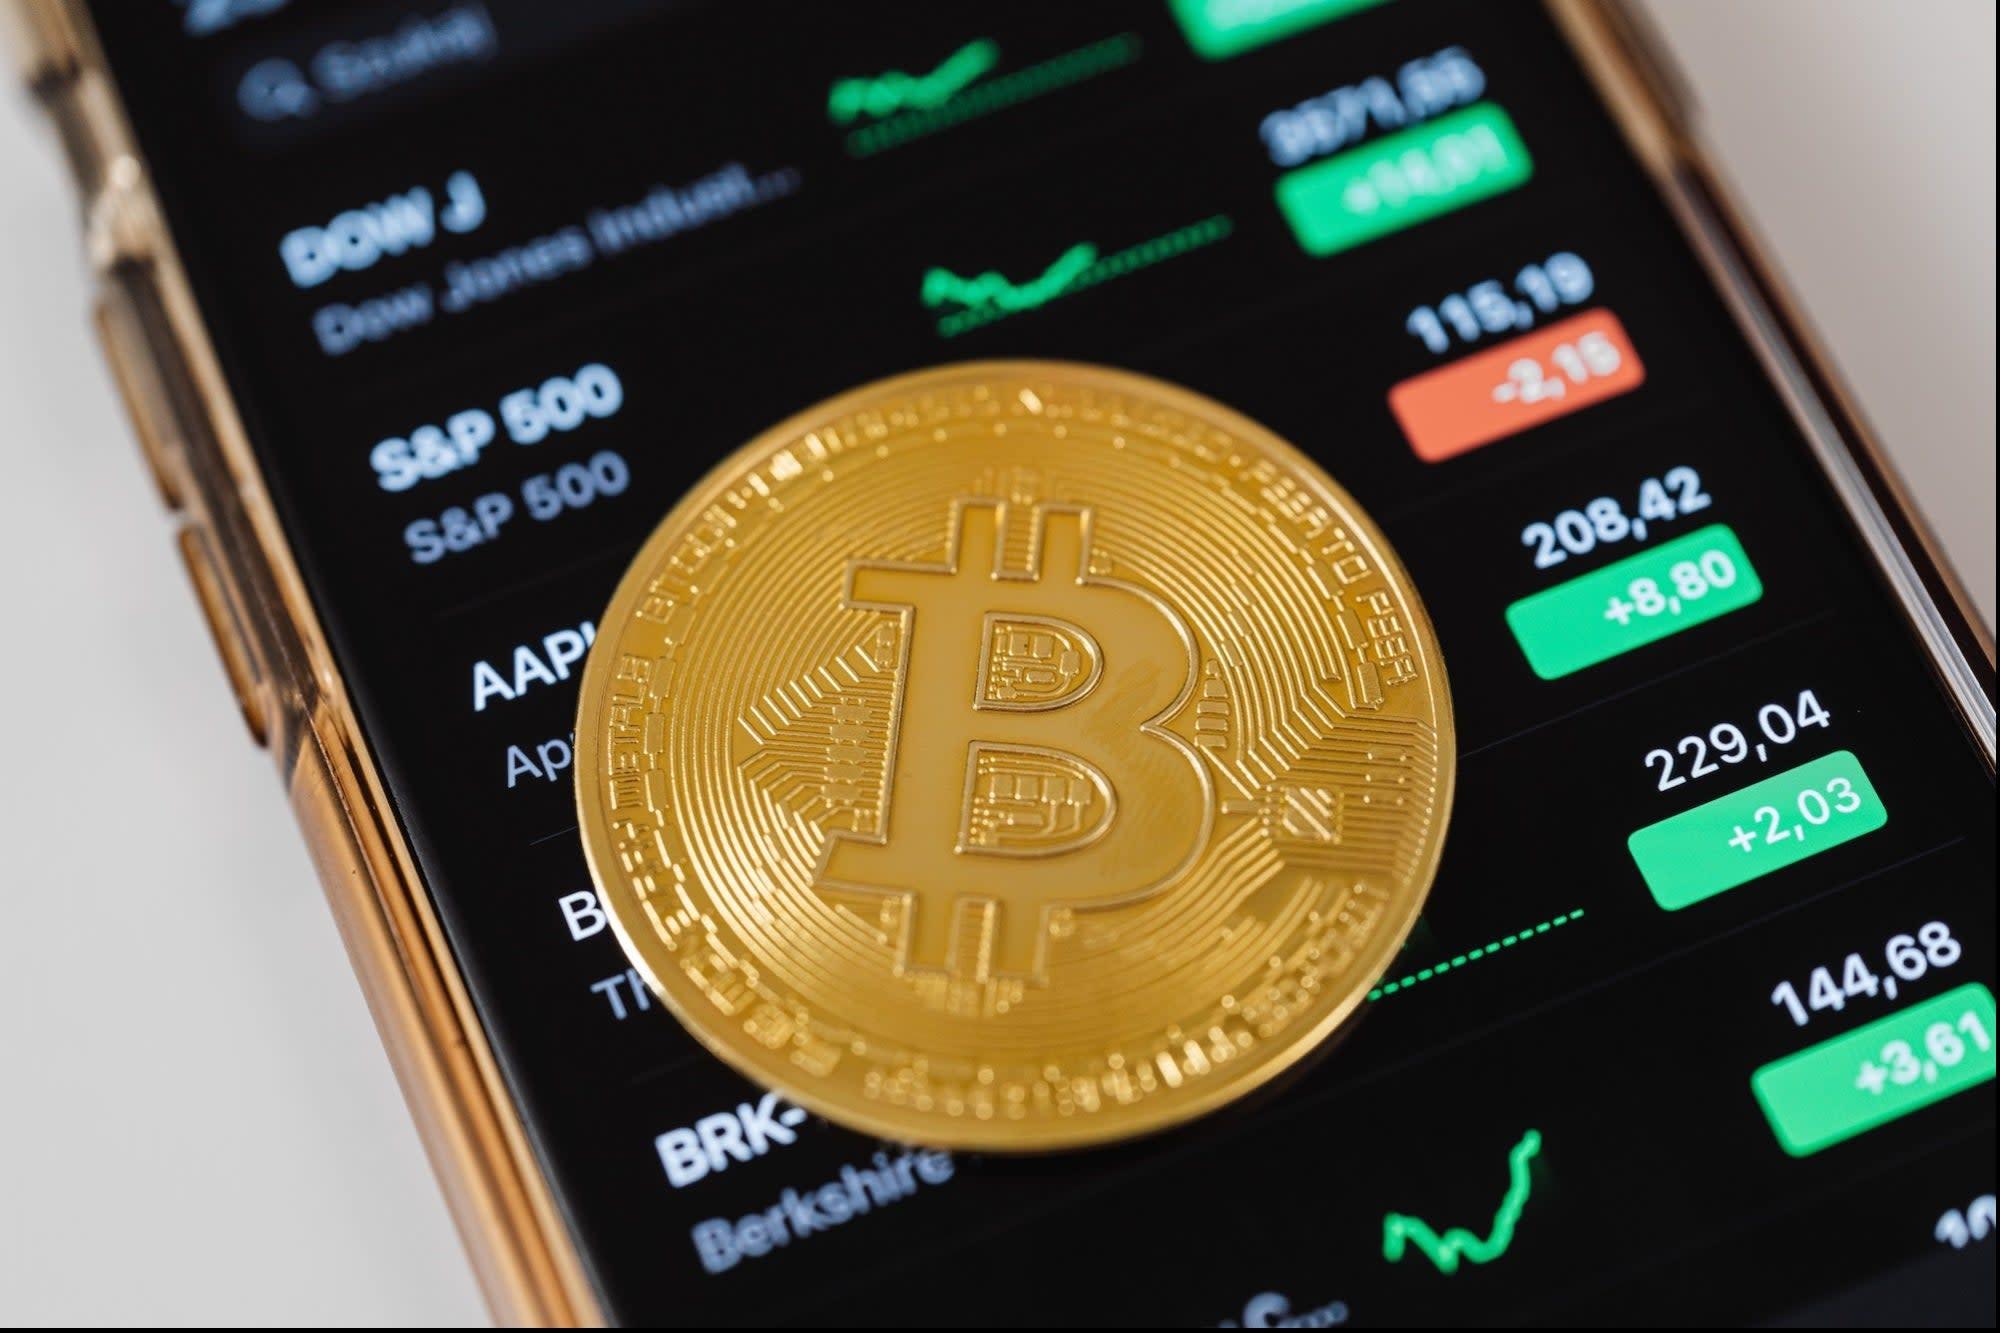 Gabriel novak bitcoins tips on betting nba teasers